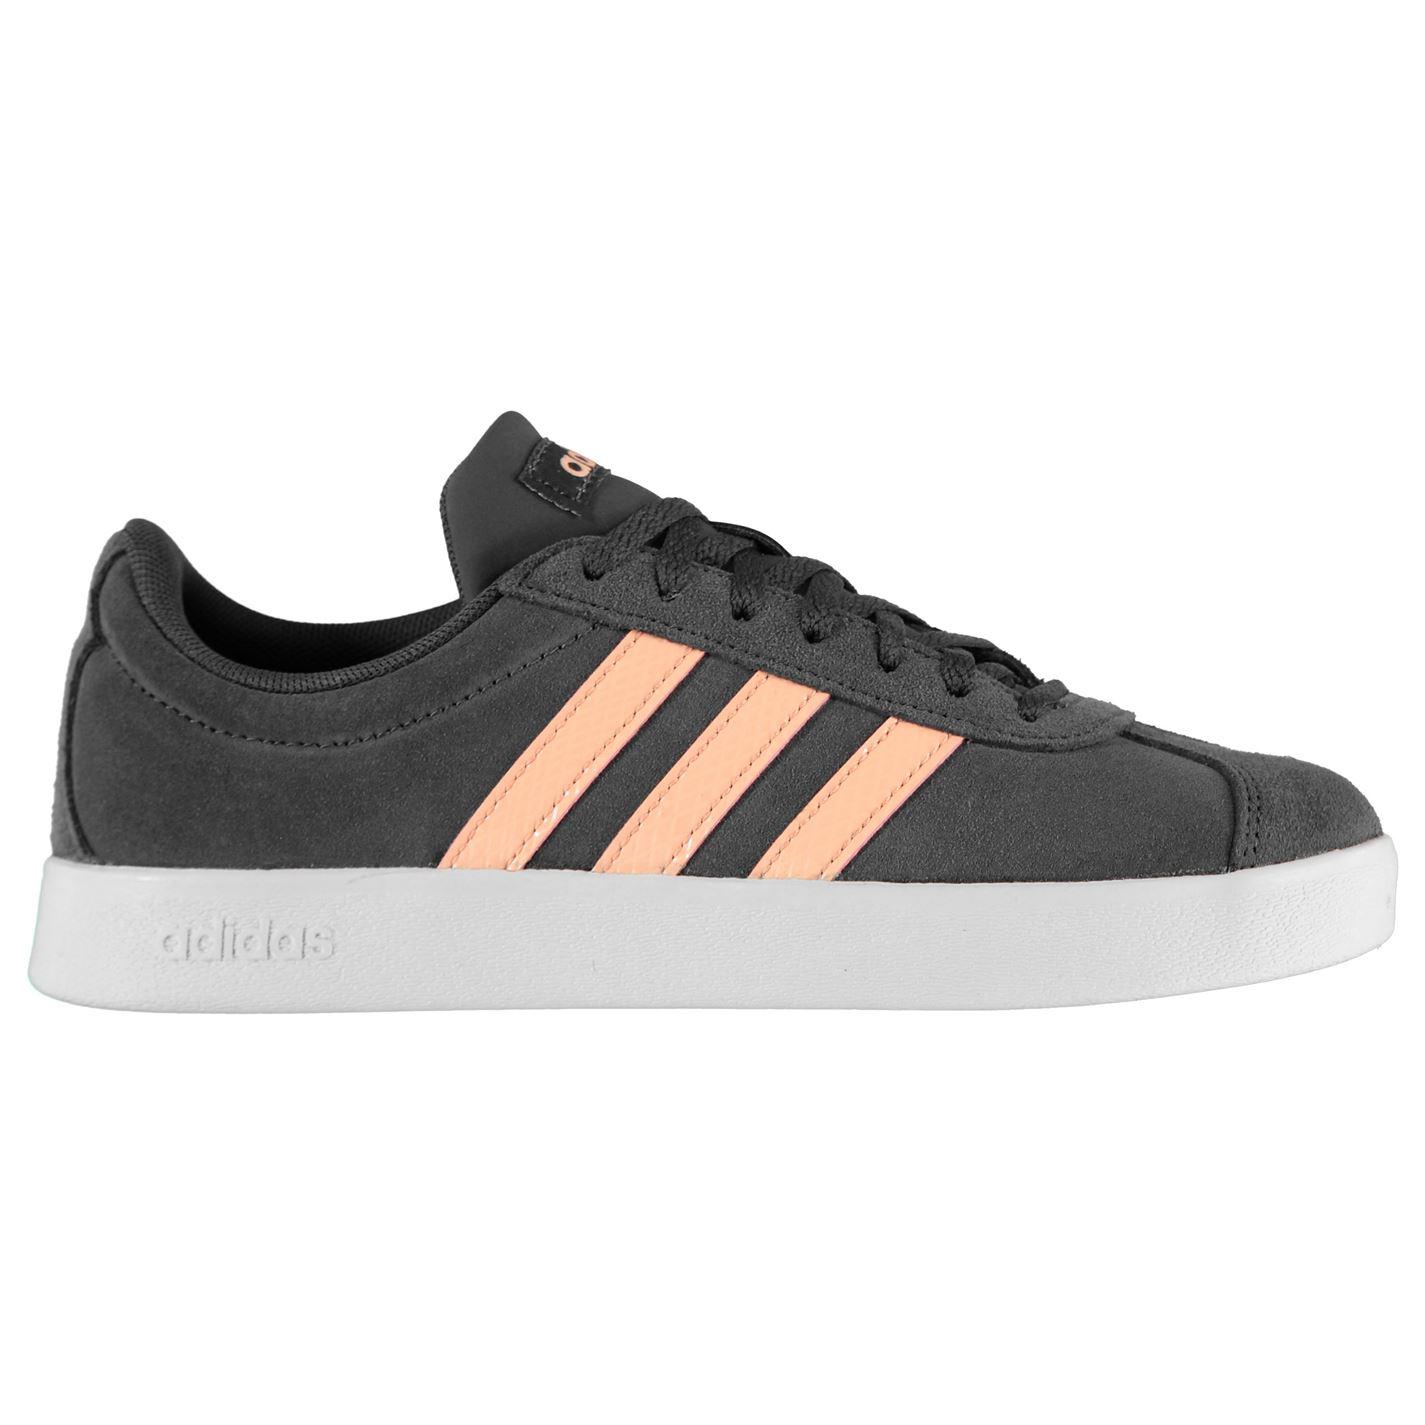 Adidas VL Court Suede dámske tenisky